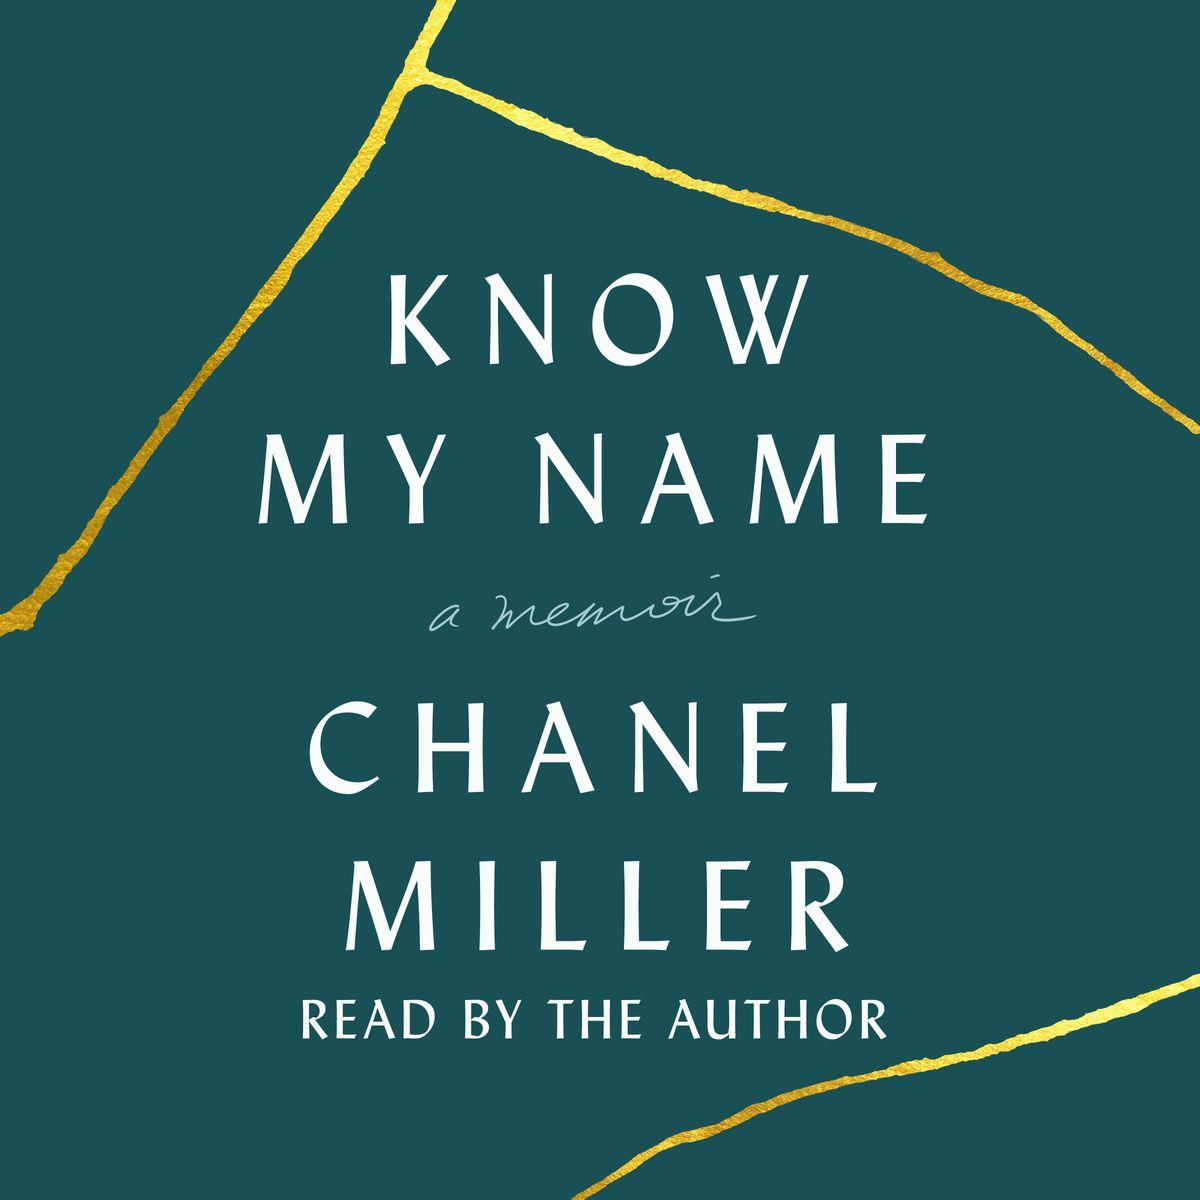 Chanel Miller - Know My Name BookZyfa